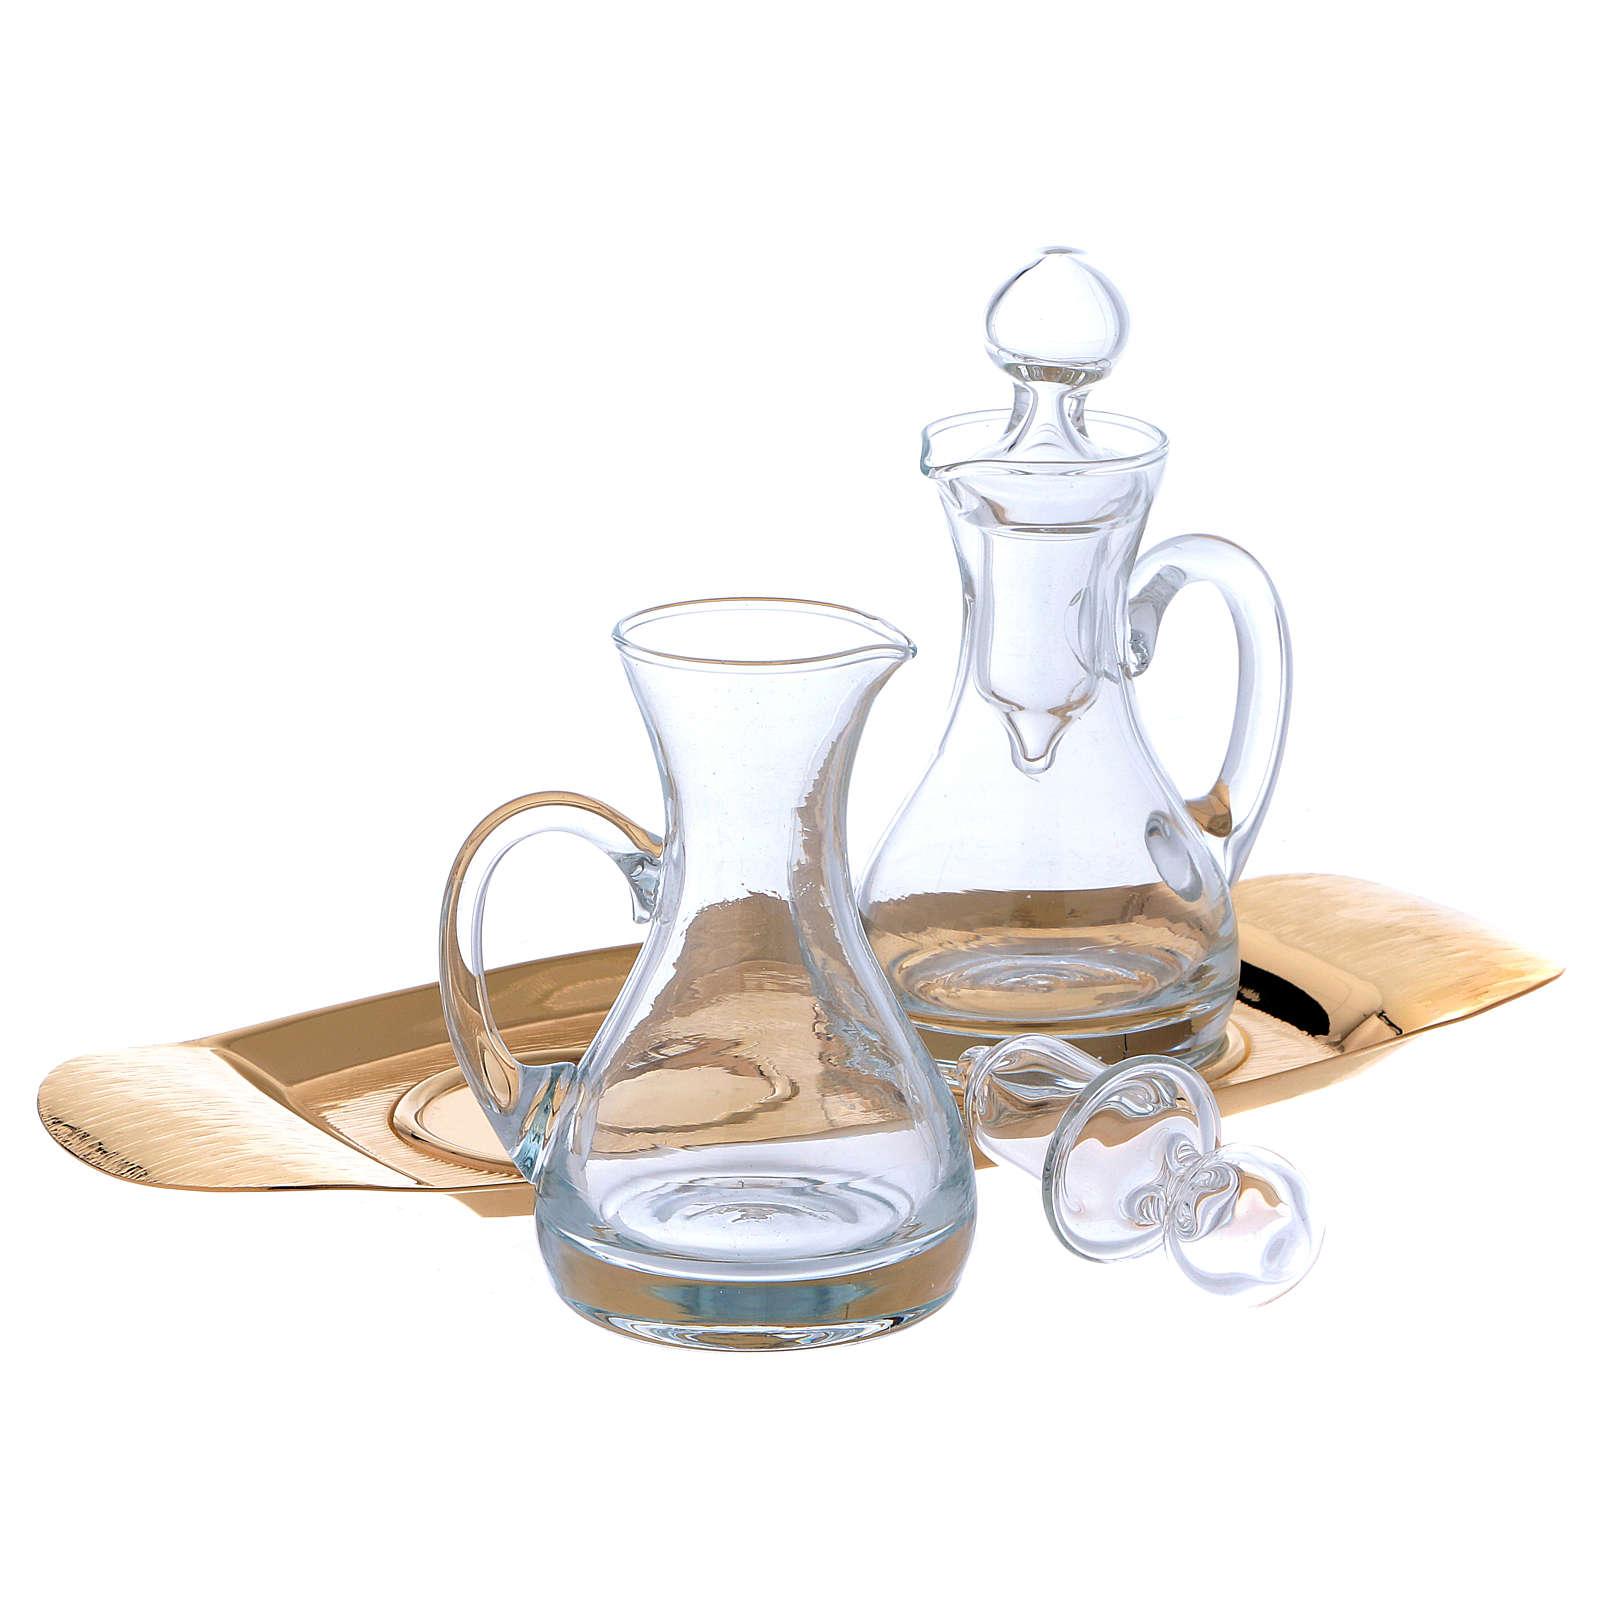 Ampolline acqua e vino Molina vetro vassoio ottone 4